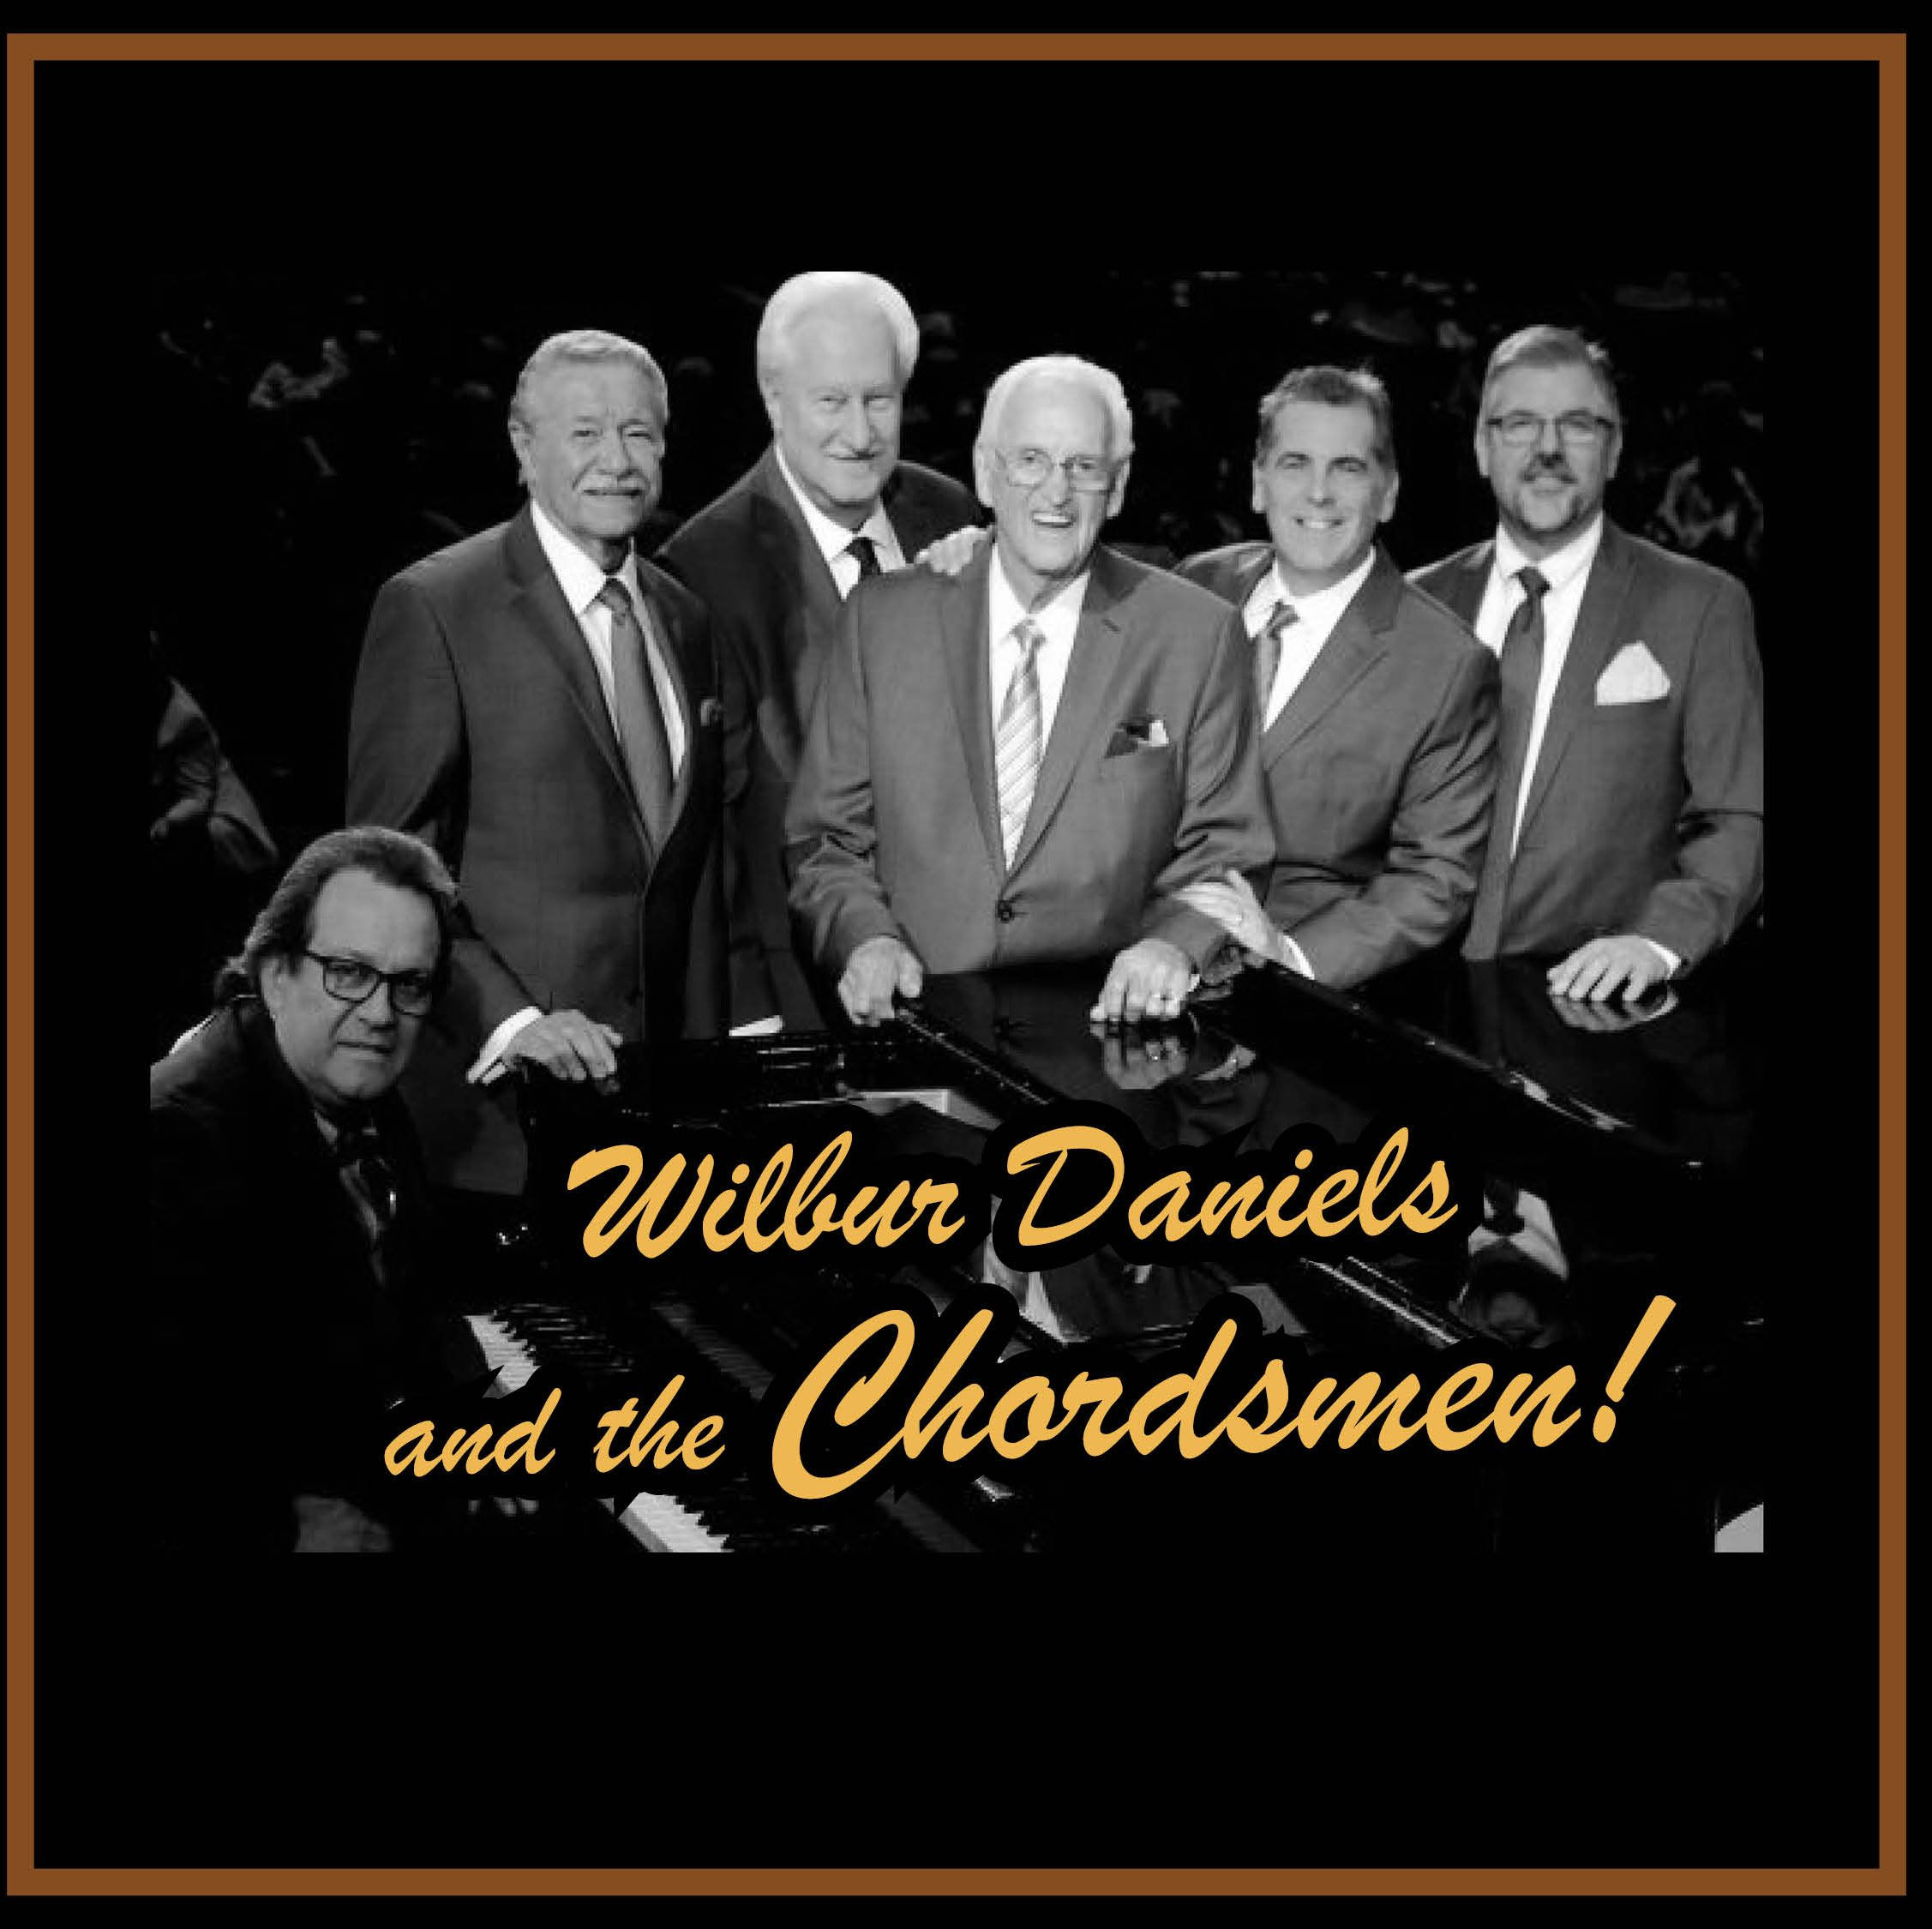 The Chordsmen